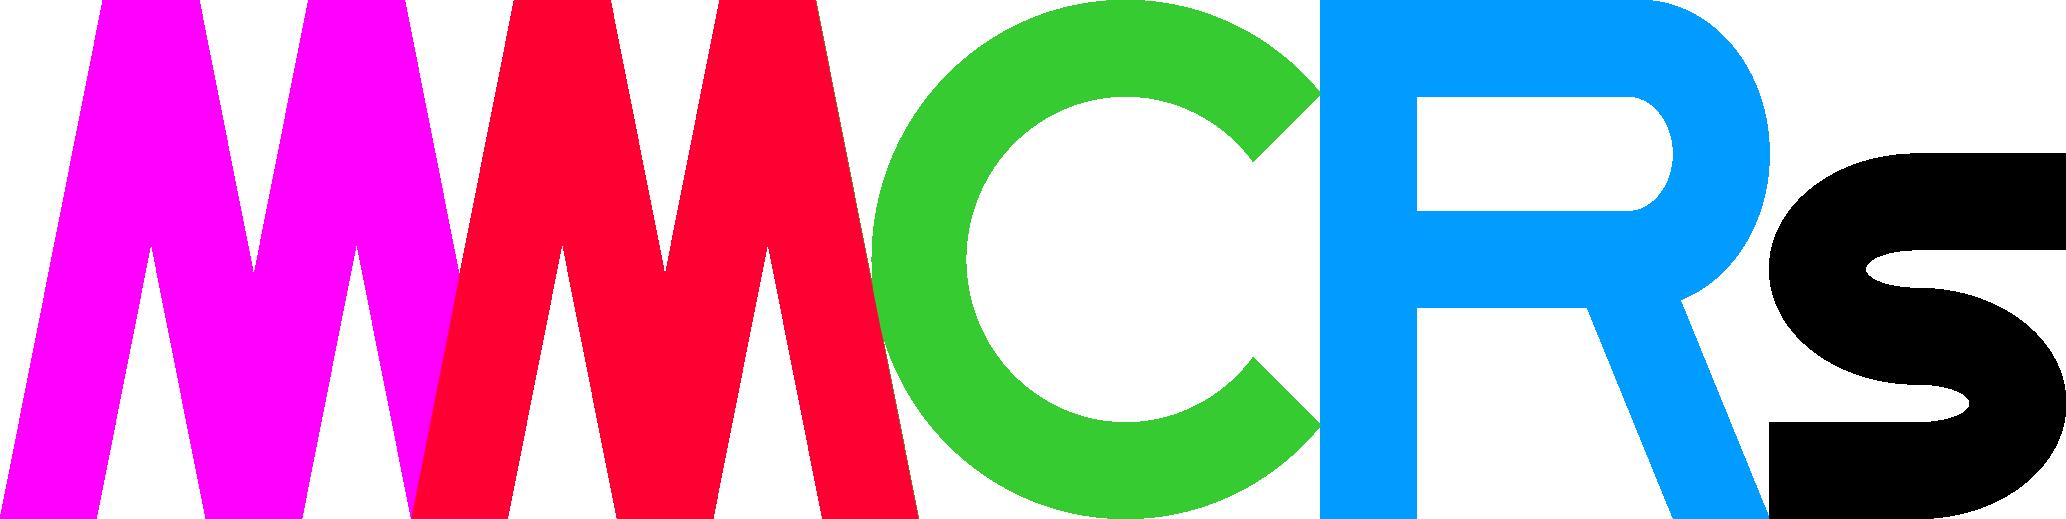 MMCRs